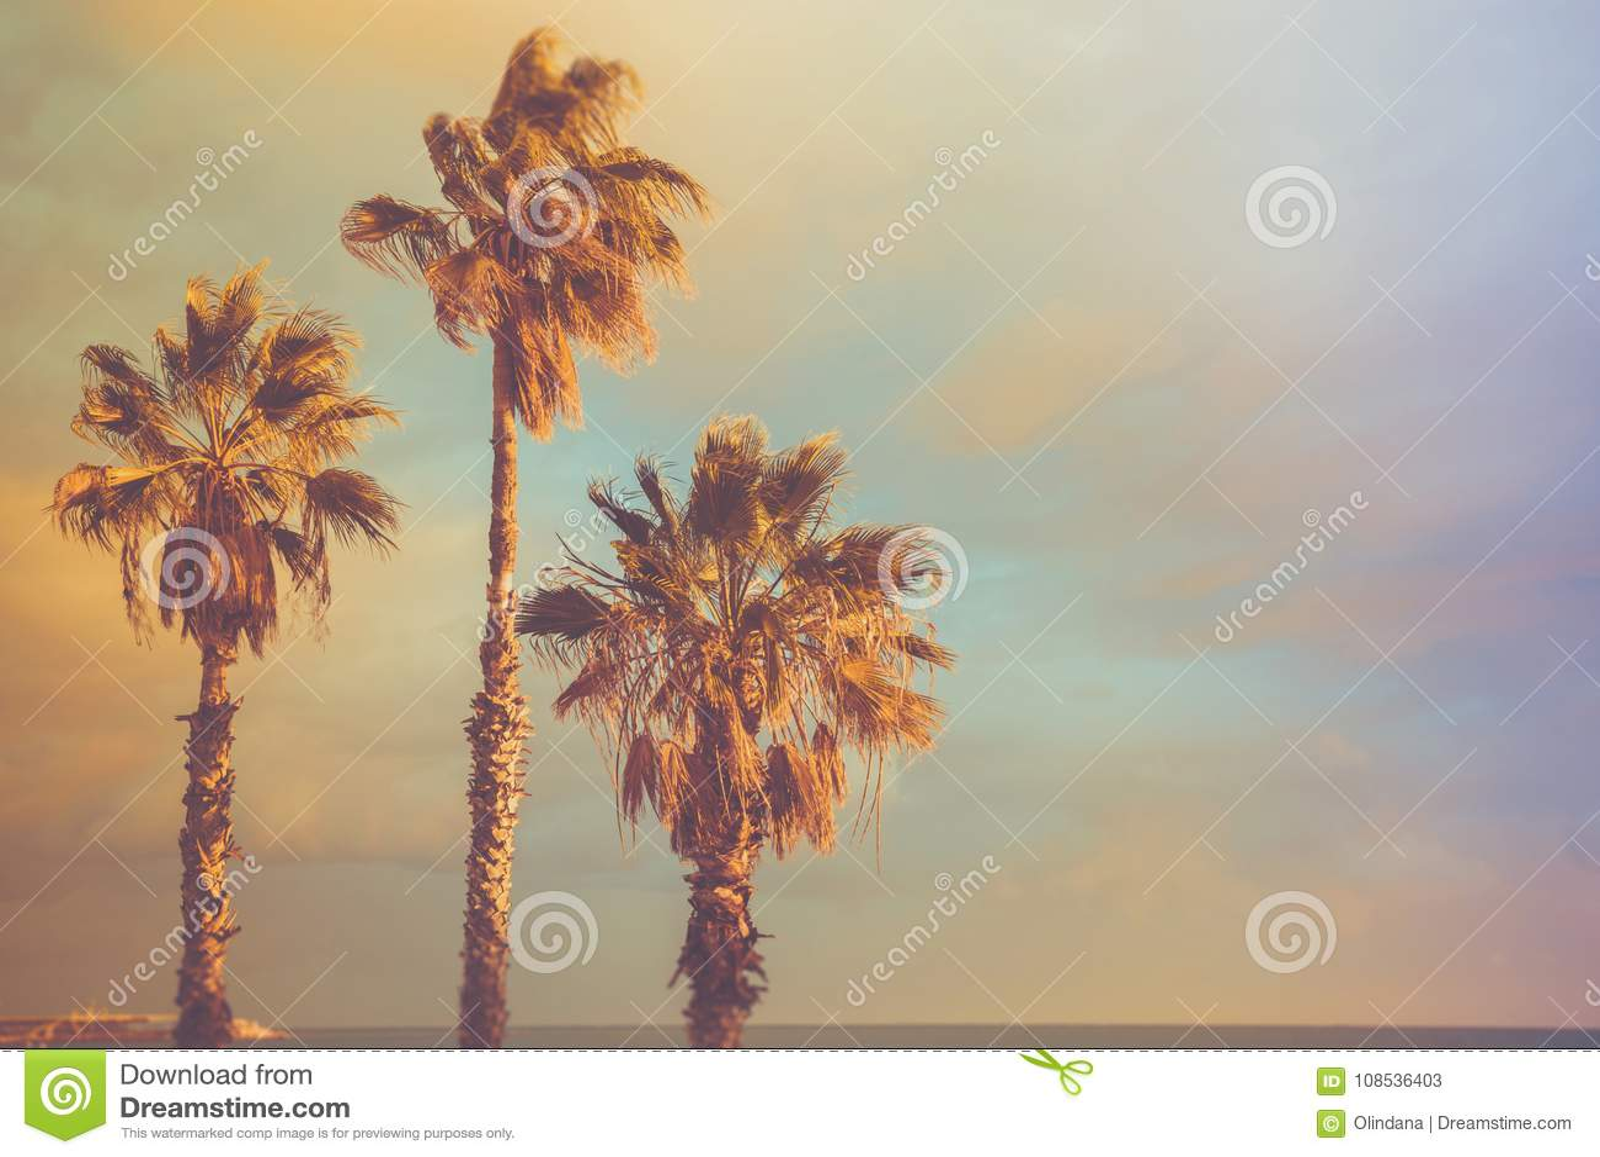 Palm Trees at Seashore Dramatic Beautiful Blue Pink Peachy Sky at Sunset. Pastel Colors Flare 60s Vintage Toning.Calm Sea Horizon